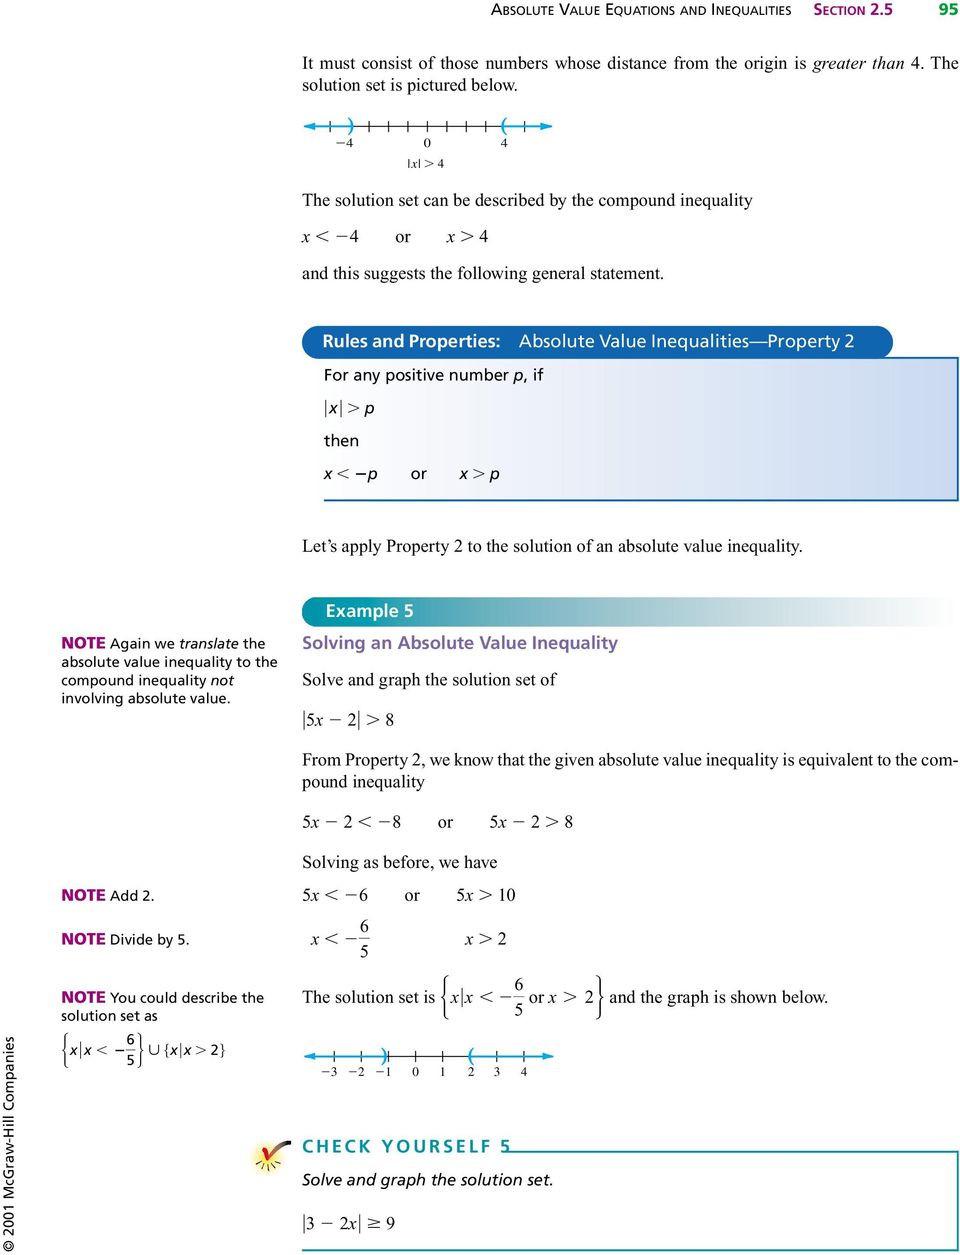 Graphing Absolute Value Inequalities Worksheet Absolute Value Equations and Inequalities Pdf Free Download